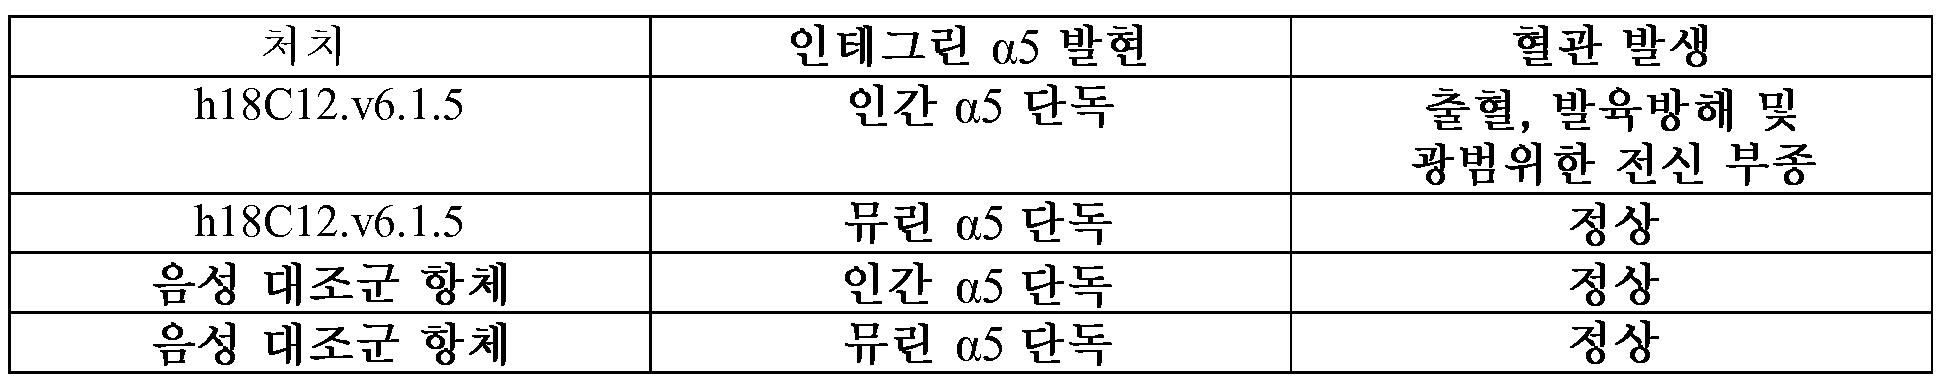 Figure 112011074210033-pct00002